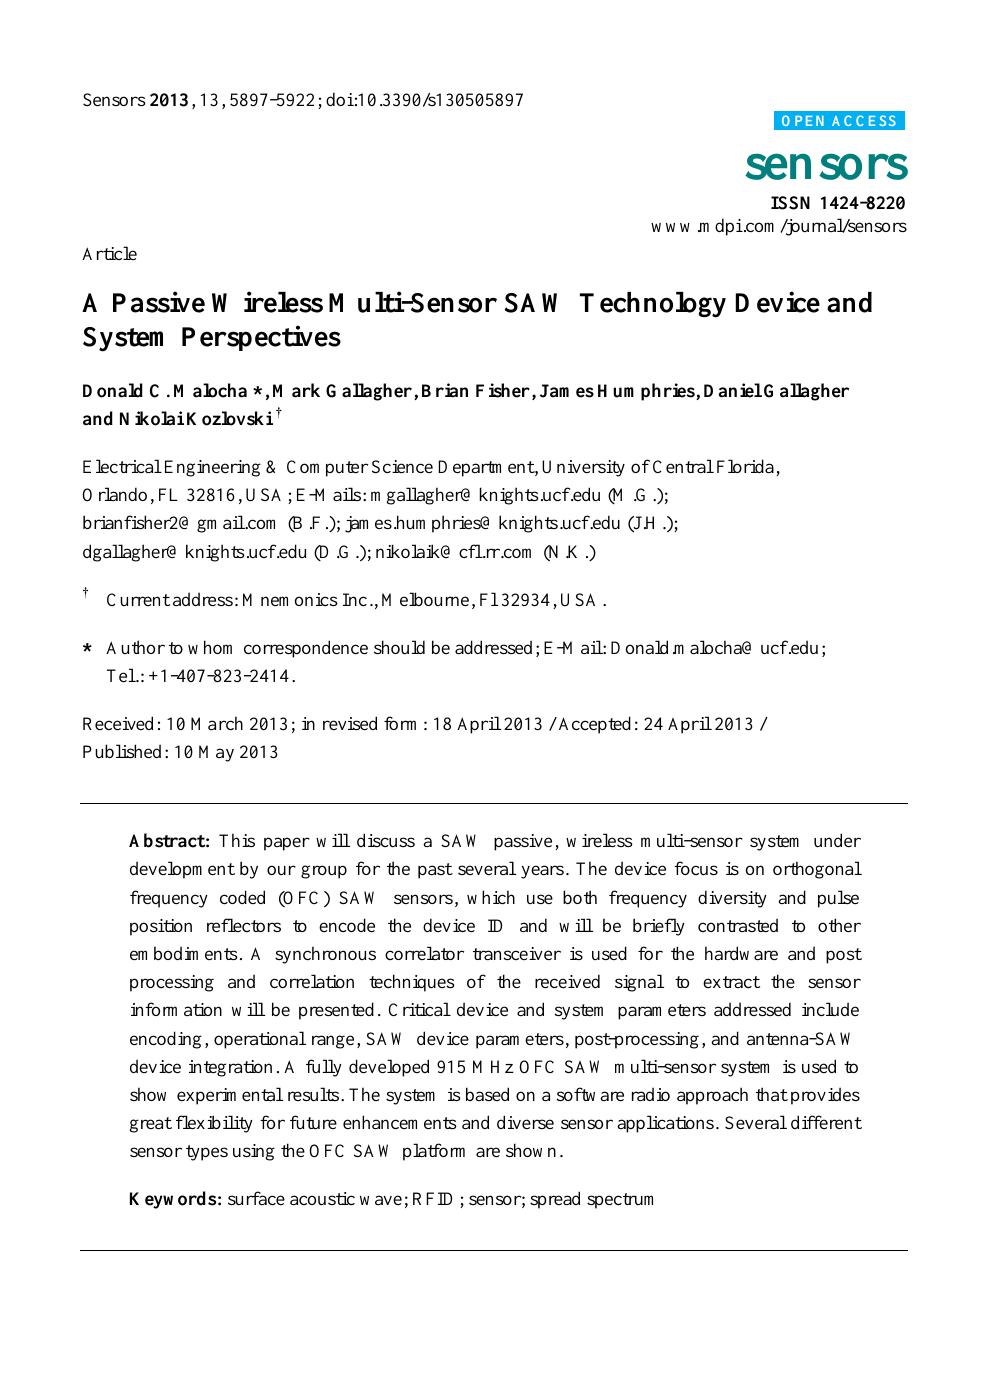 A Passive Wireless Multi-Sensor SAW Technology Device and